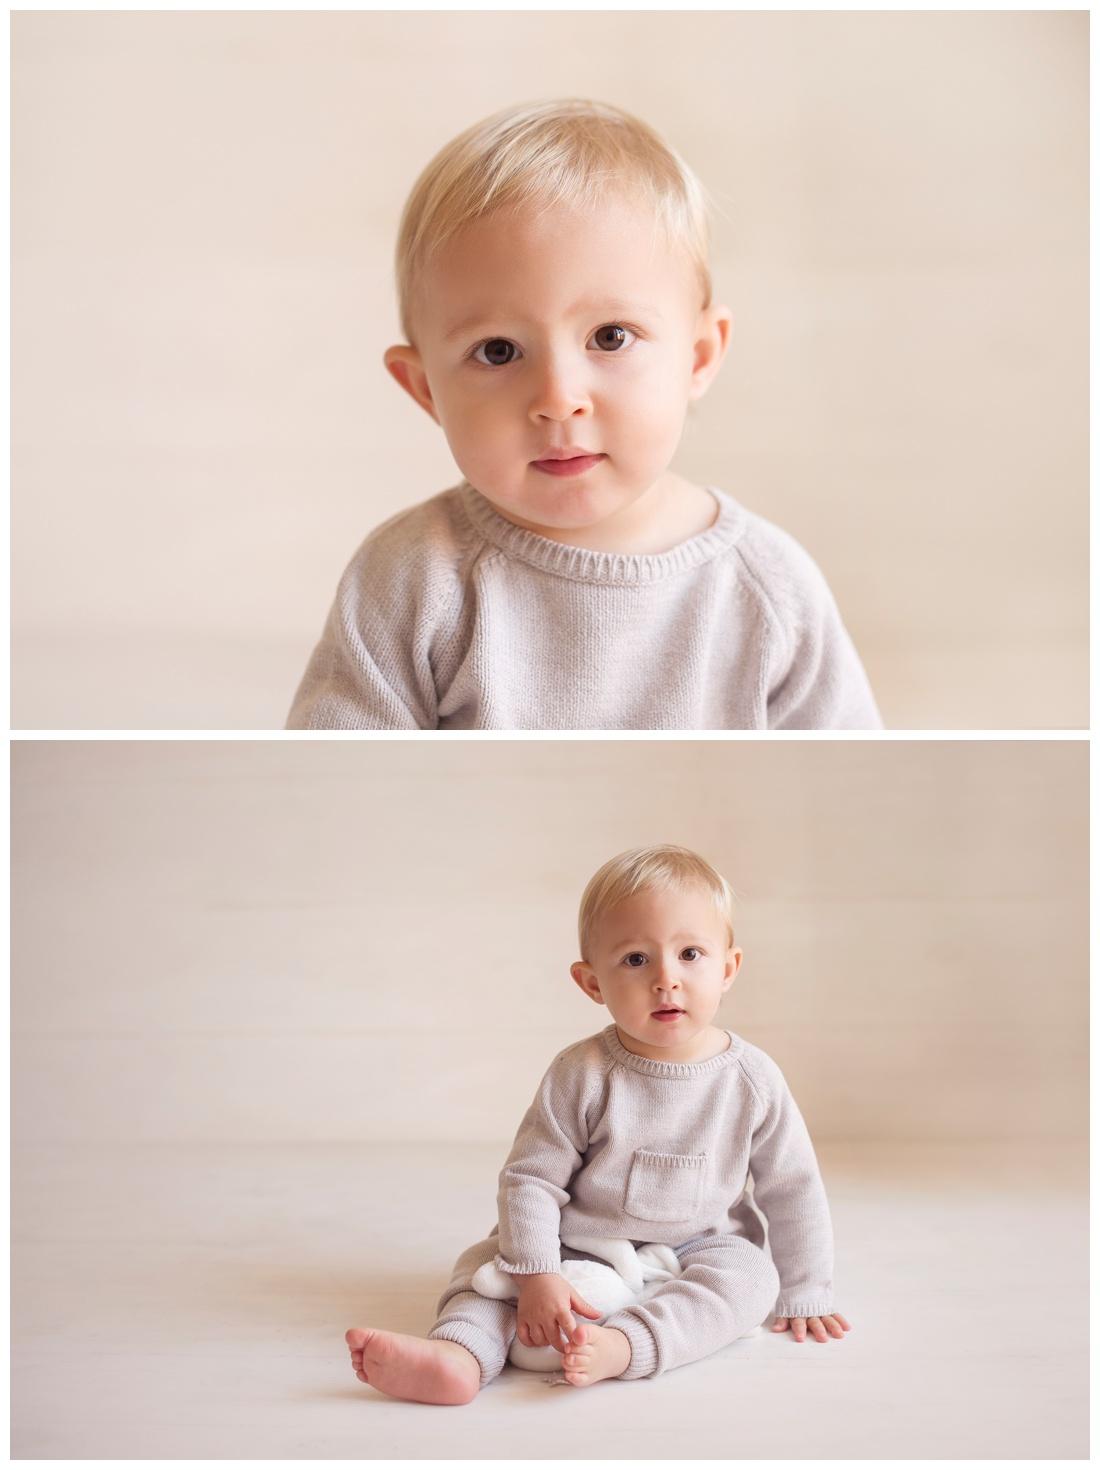 fotografo bambini_0002.jpg